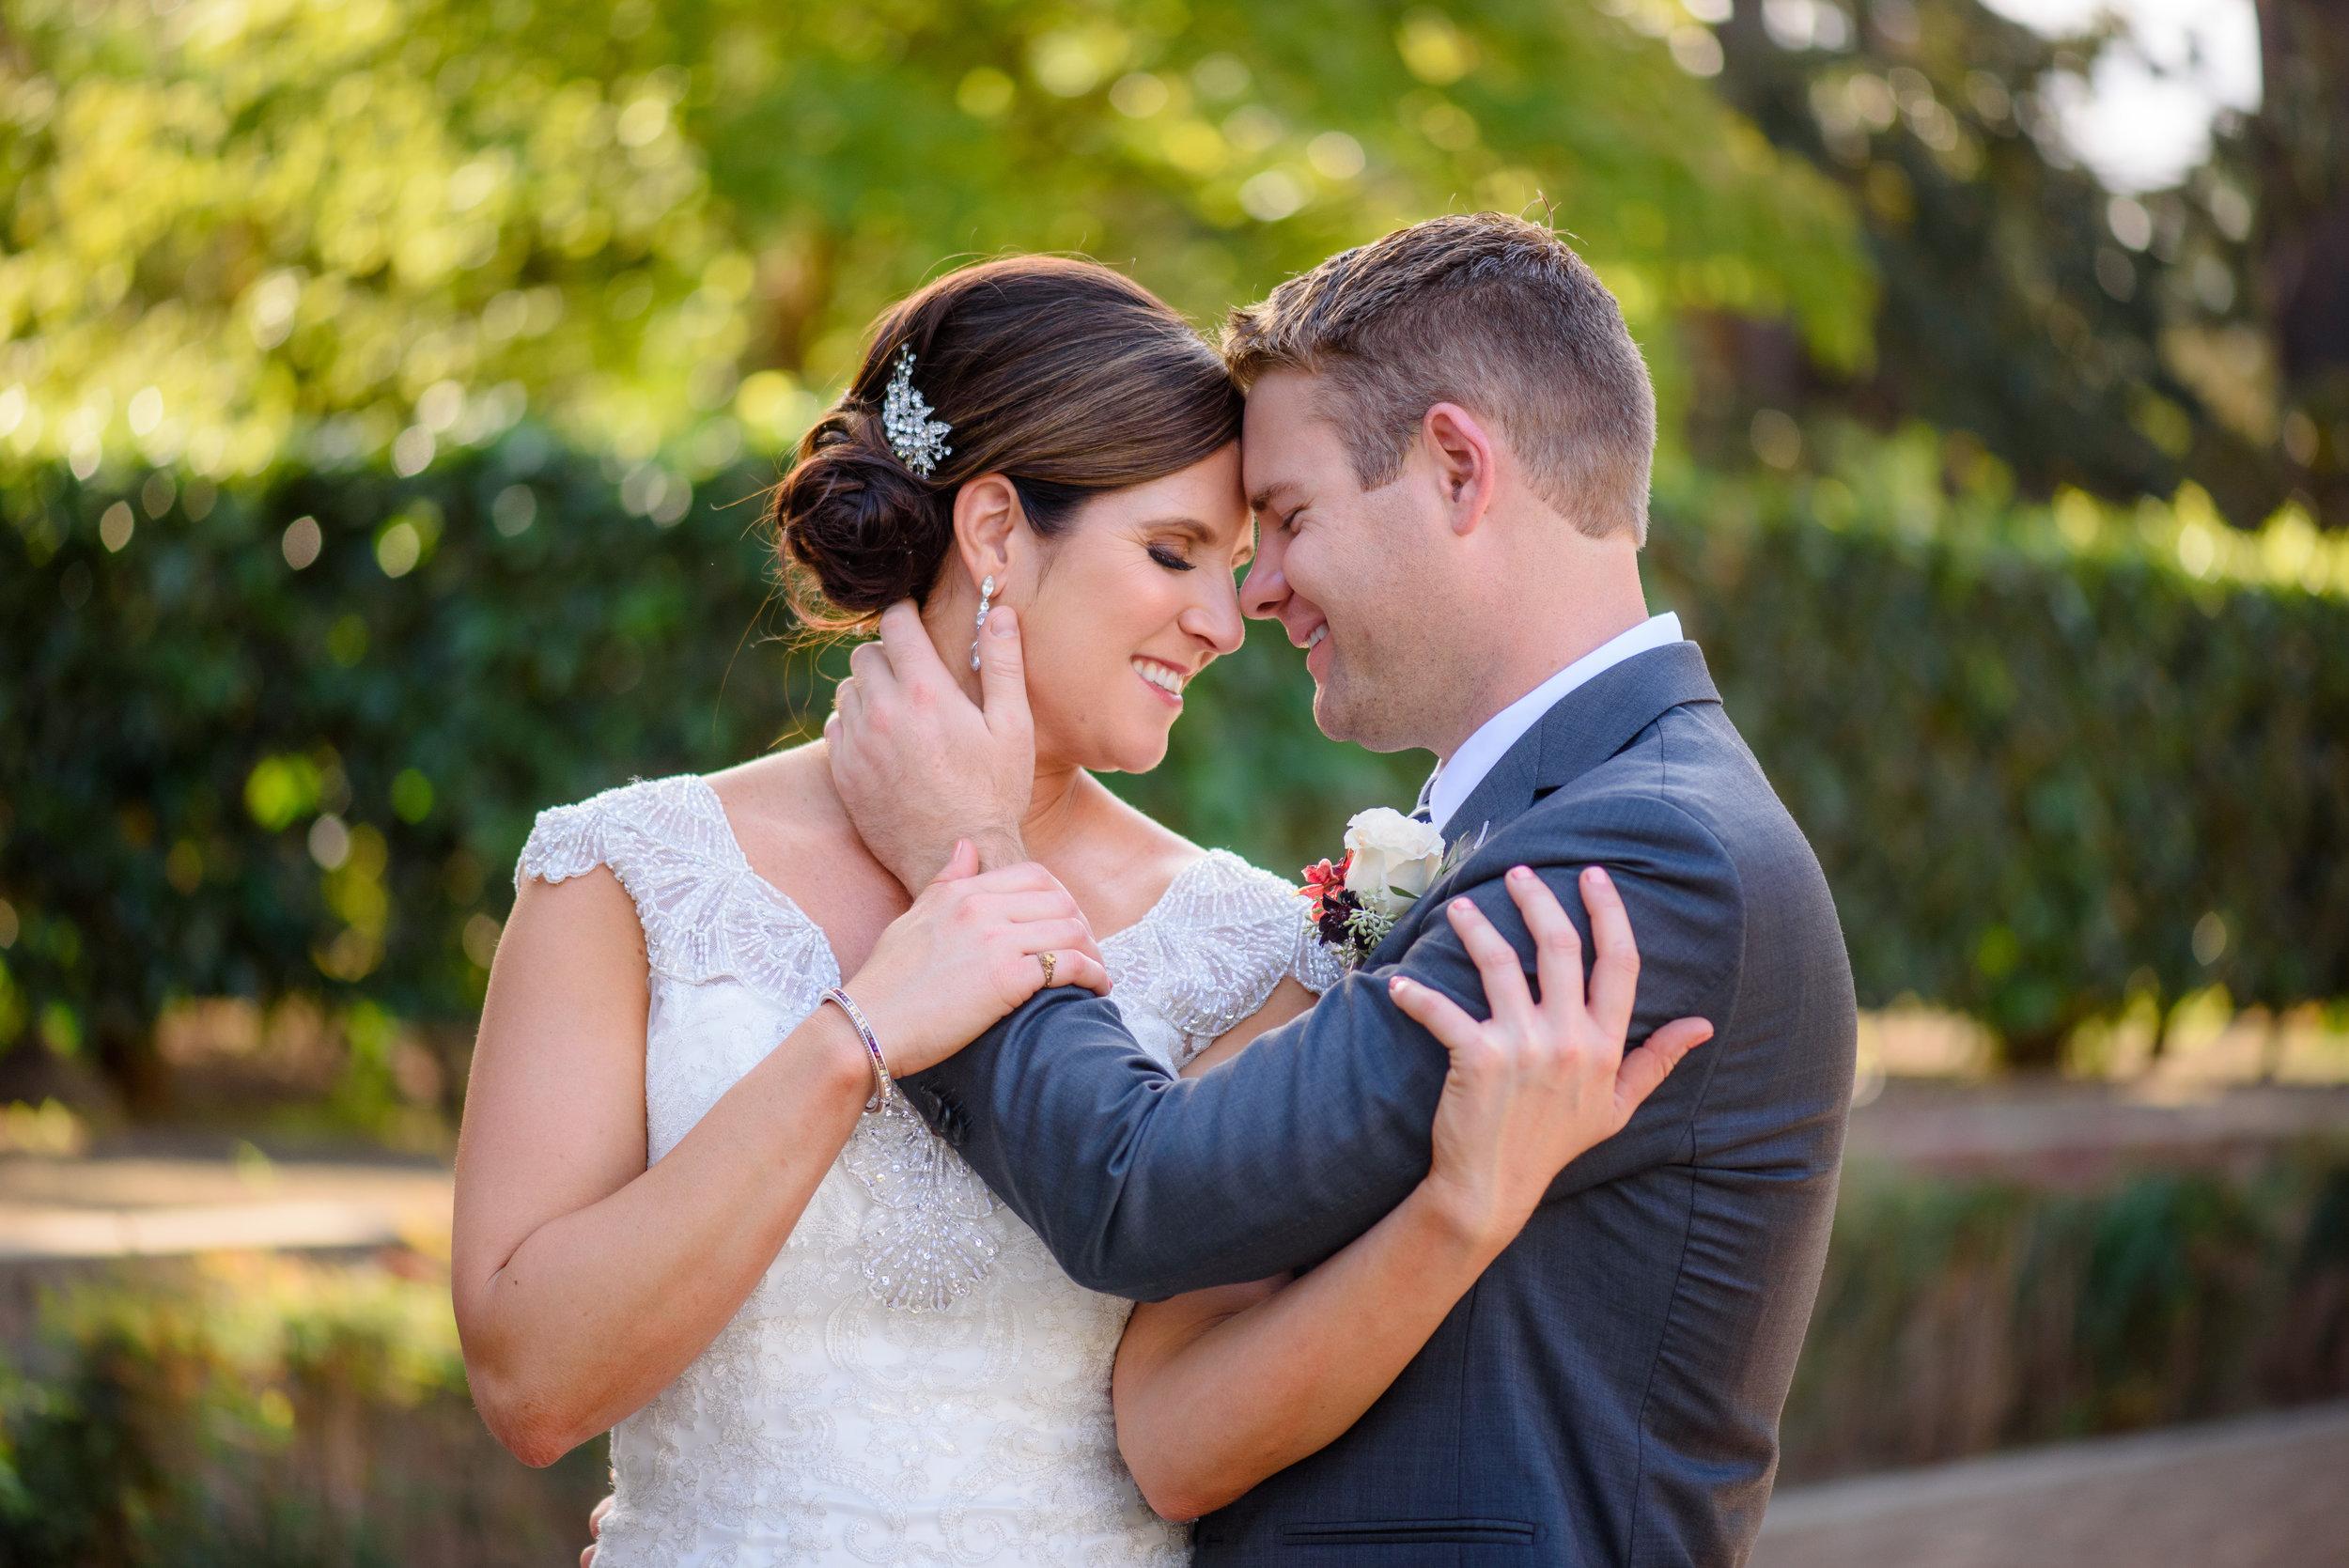 annie-brian-017-antiquite-midtown-sacramento-wedding-photographer-katherine-nicole-photography.JPG